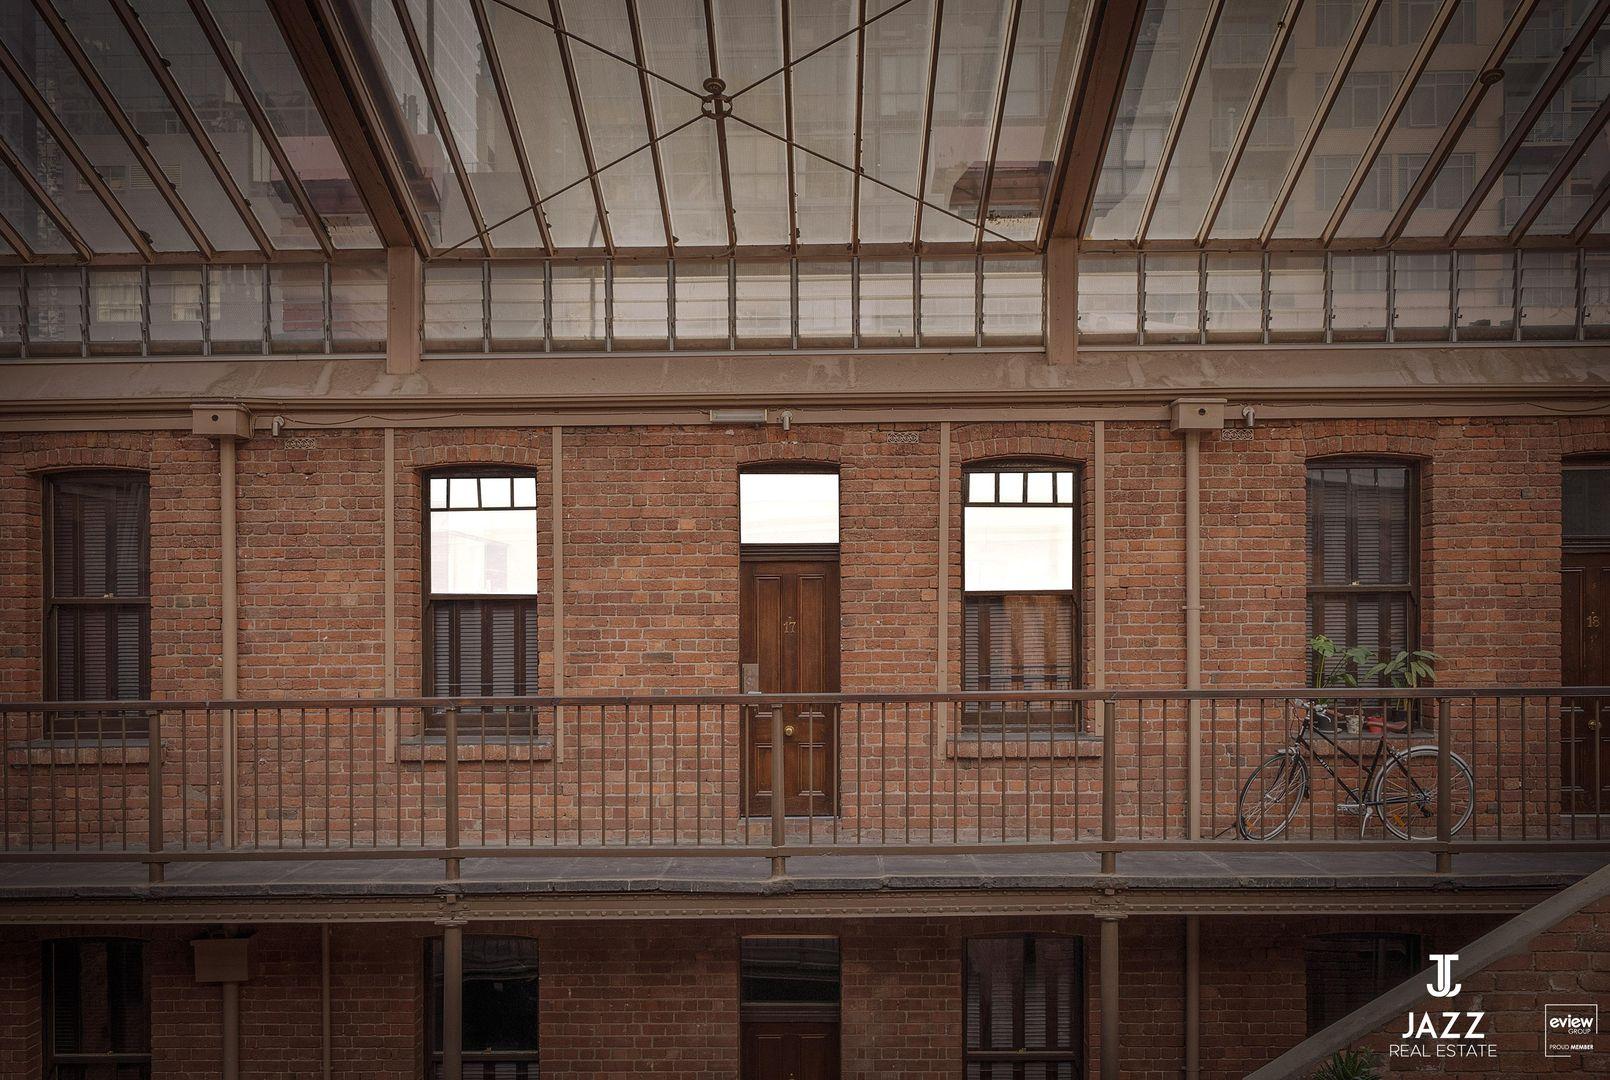 1 bedrooms Apartment / Unit / Flat in 17/24-38 Little Bourke Street MELBOURNE VIC, 3000